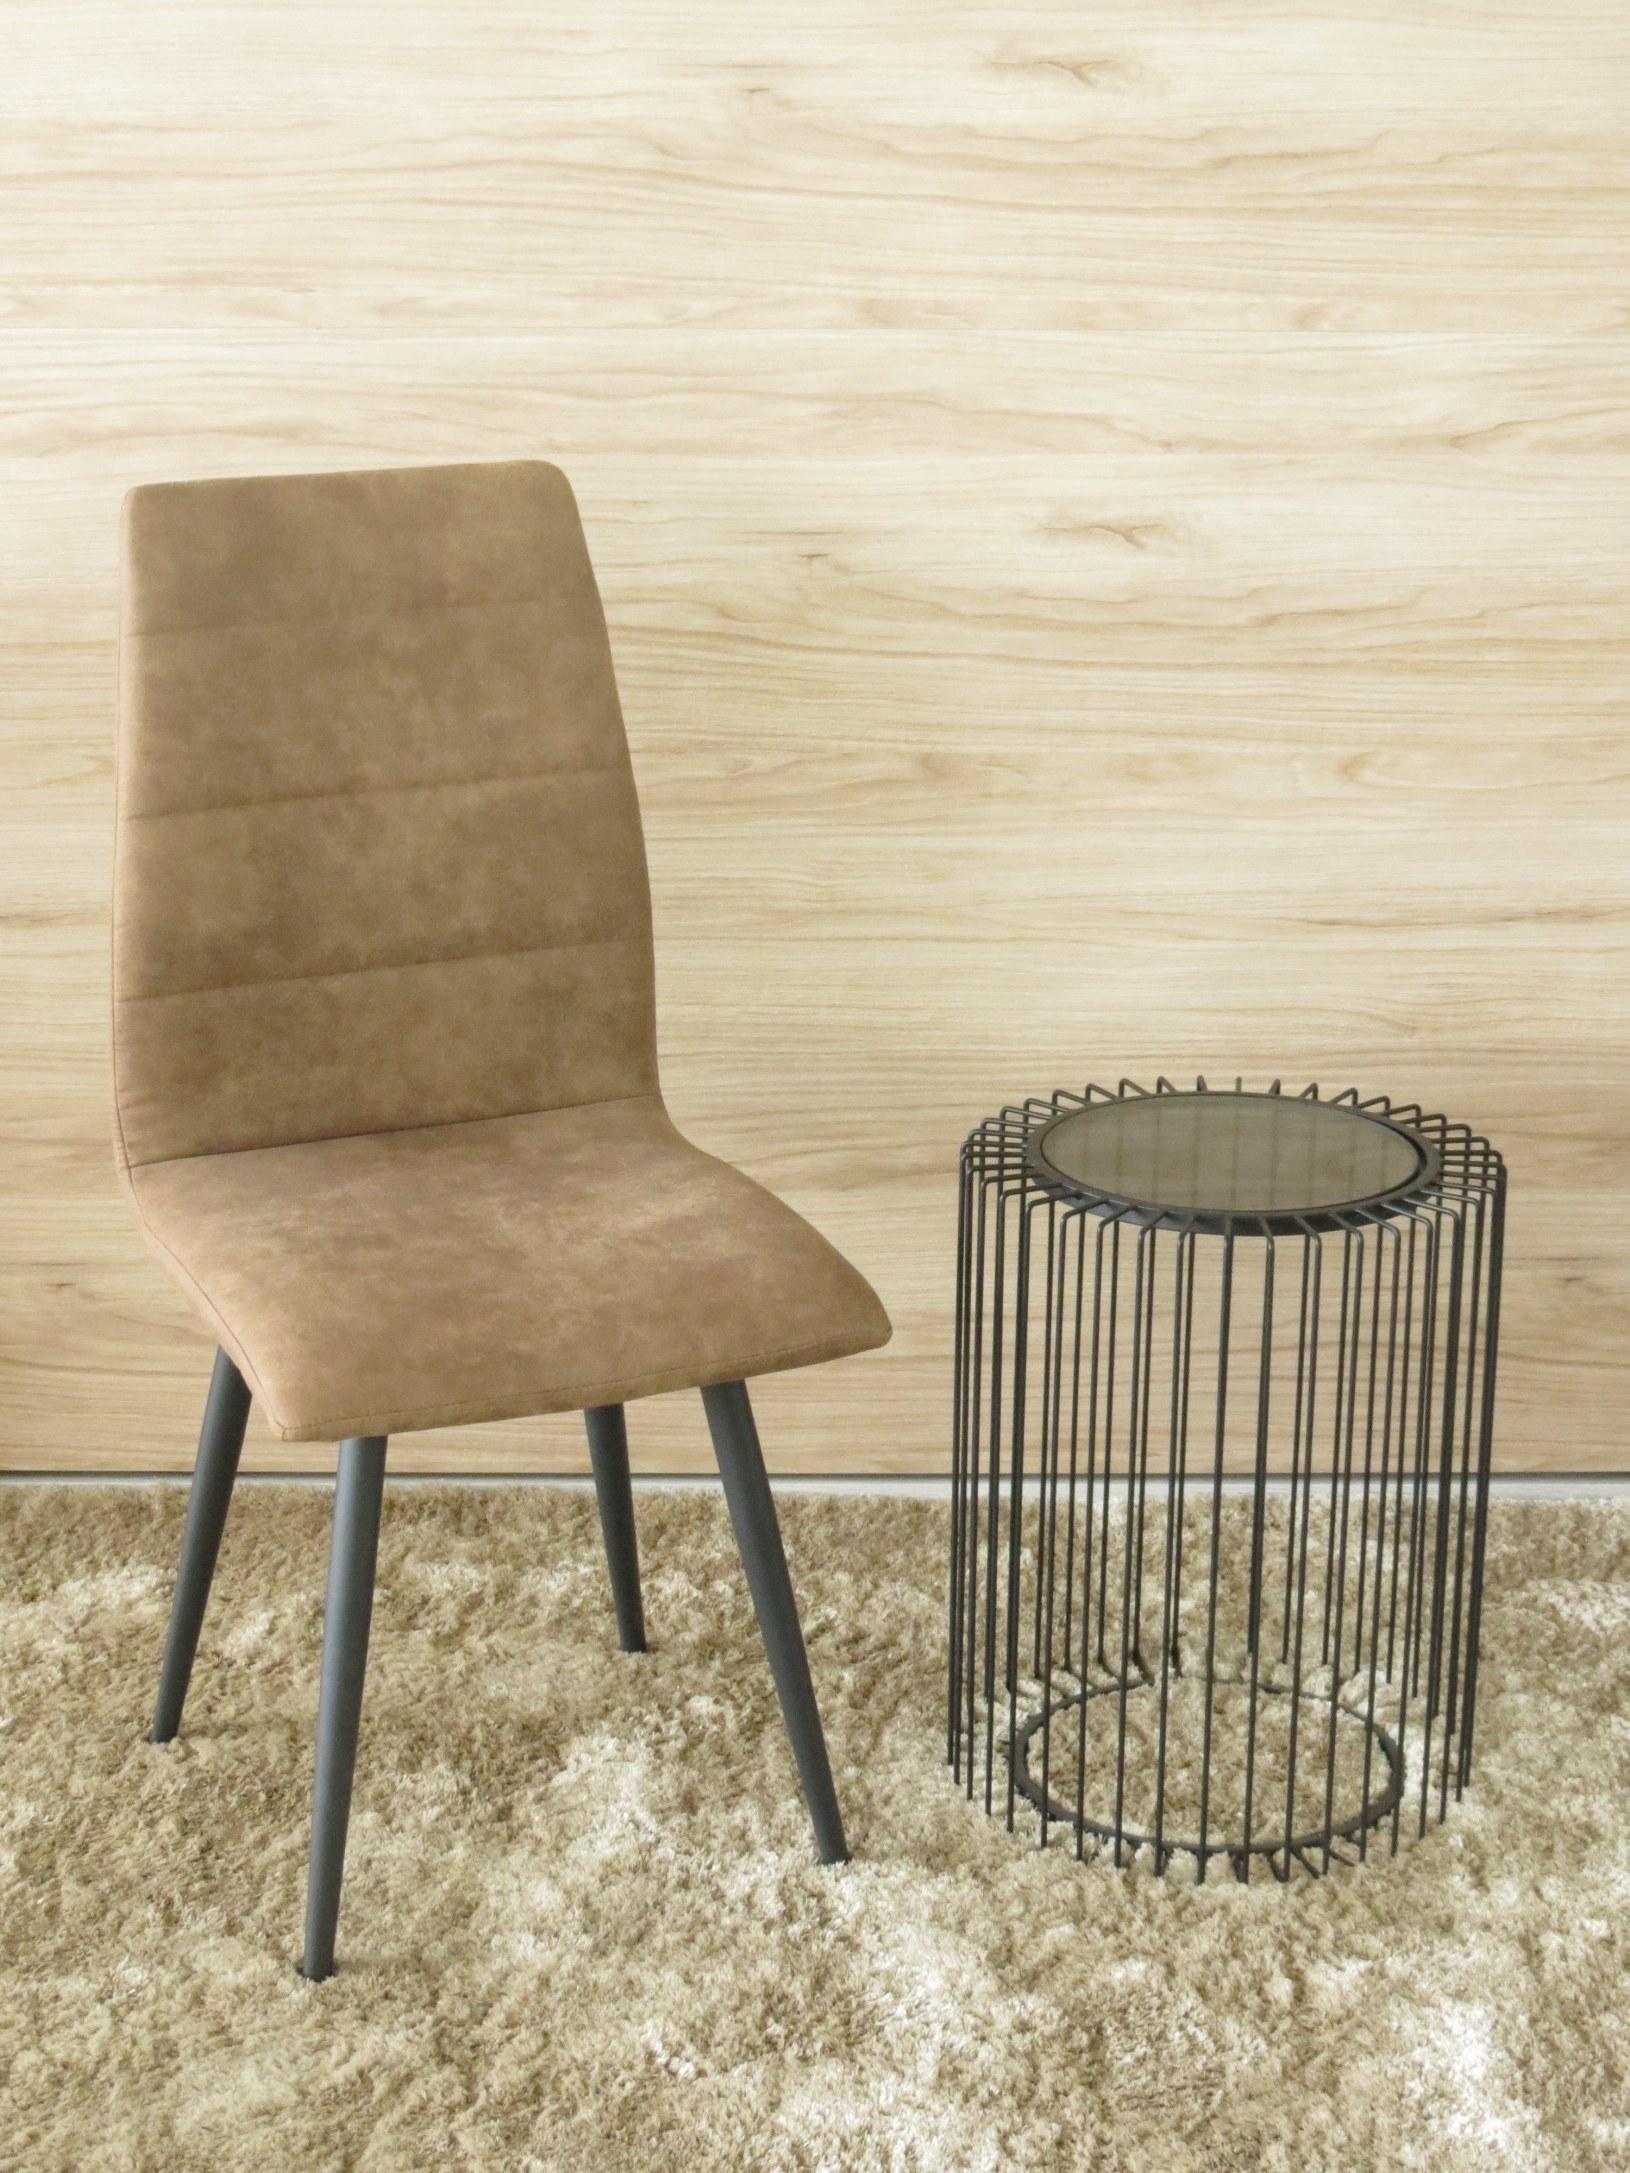 salle à manger-chaise-juliette